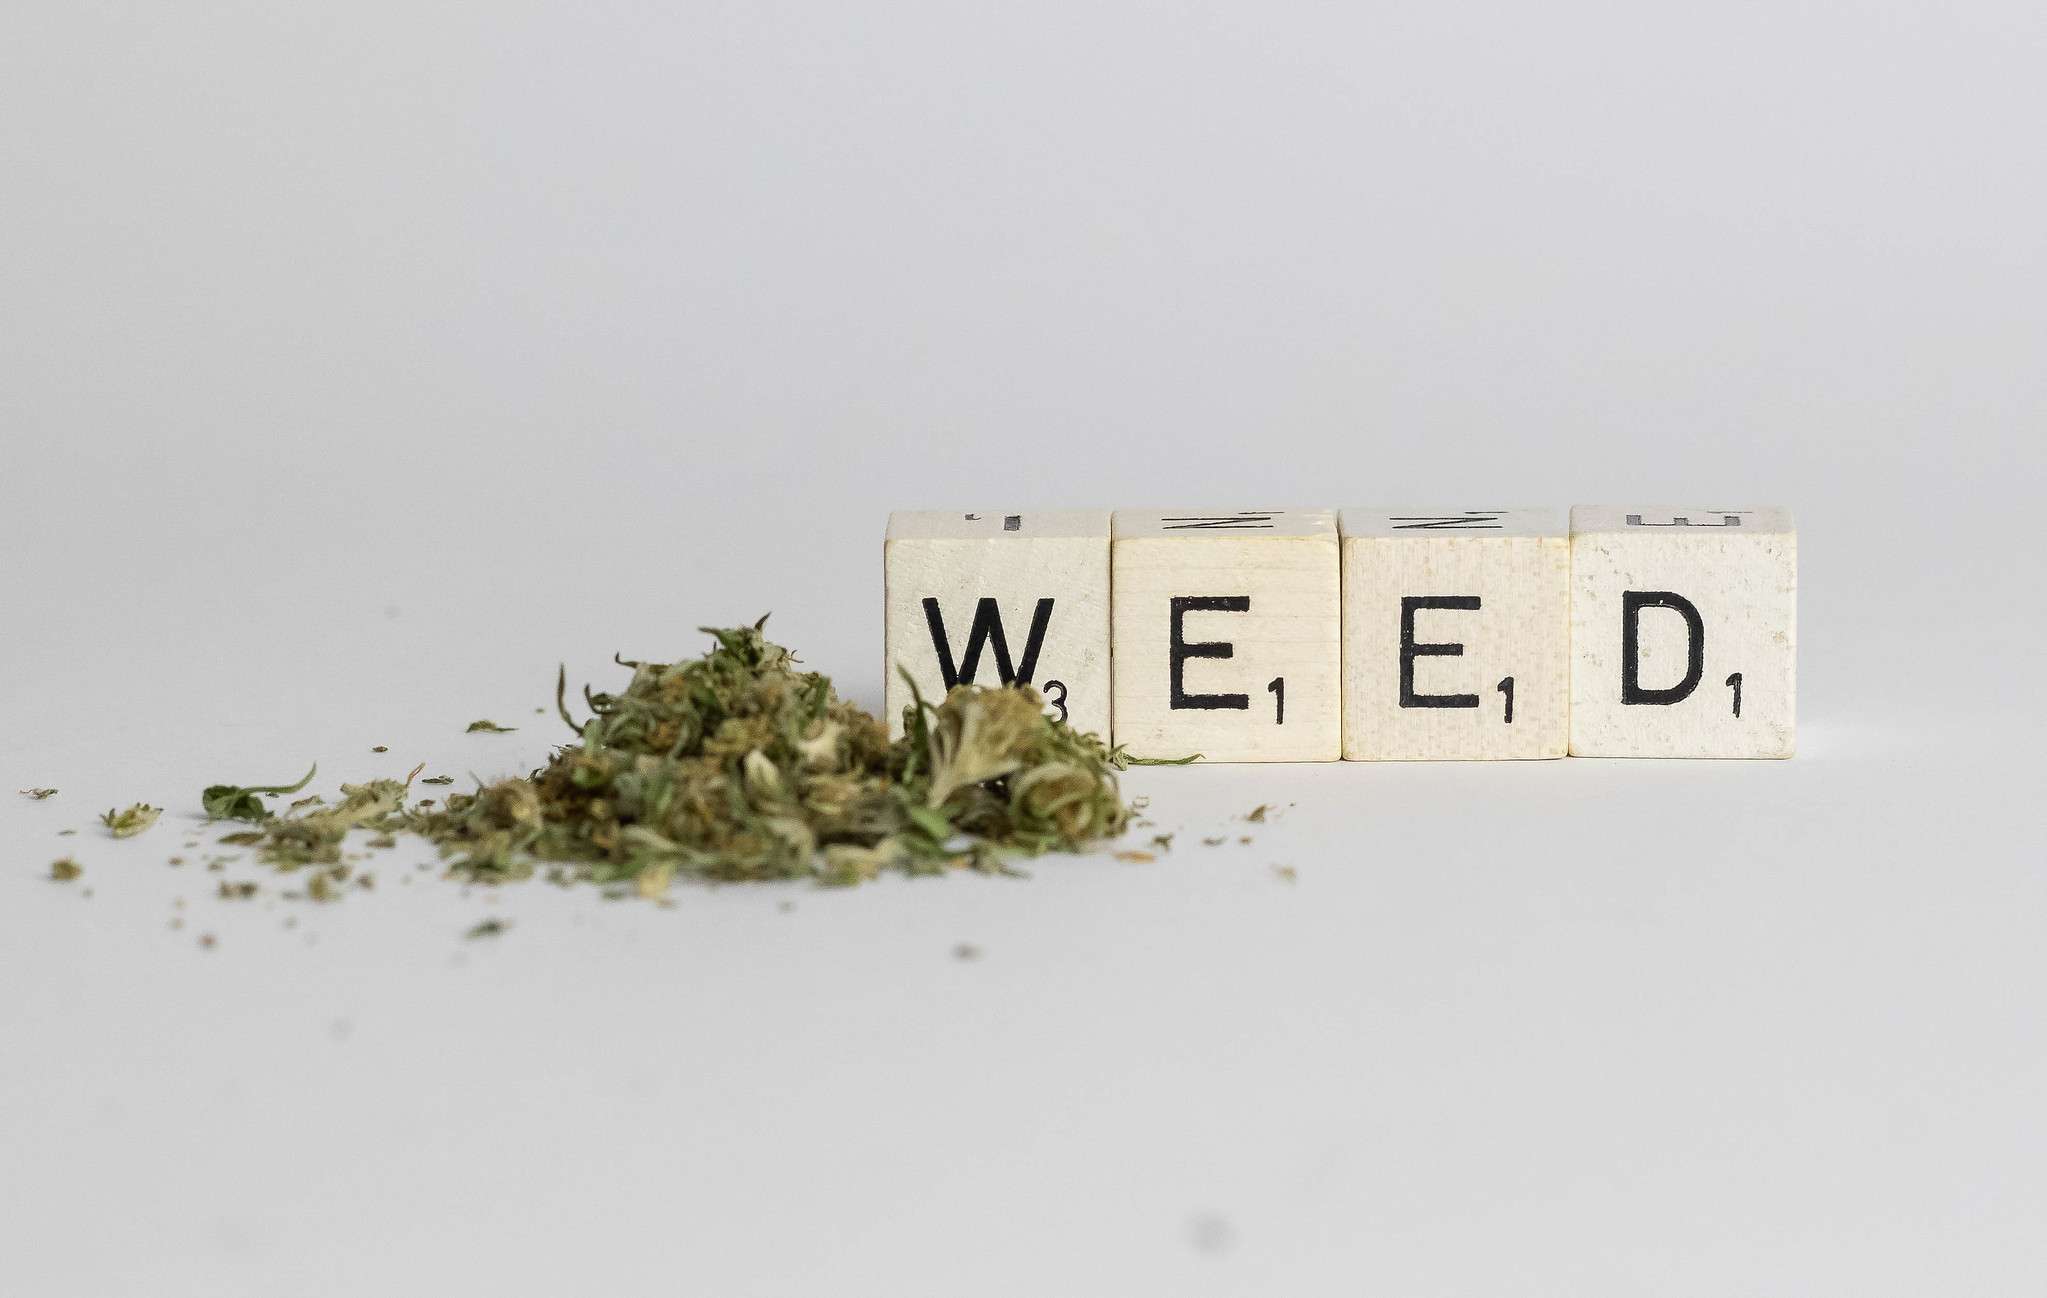 Aleafia Health Leads Course For Cannabis Stocks | PublicWire